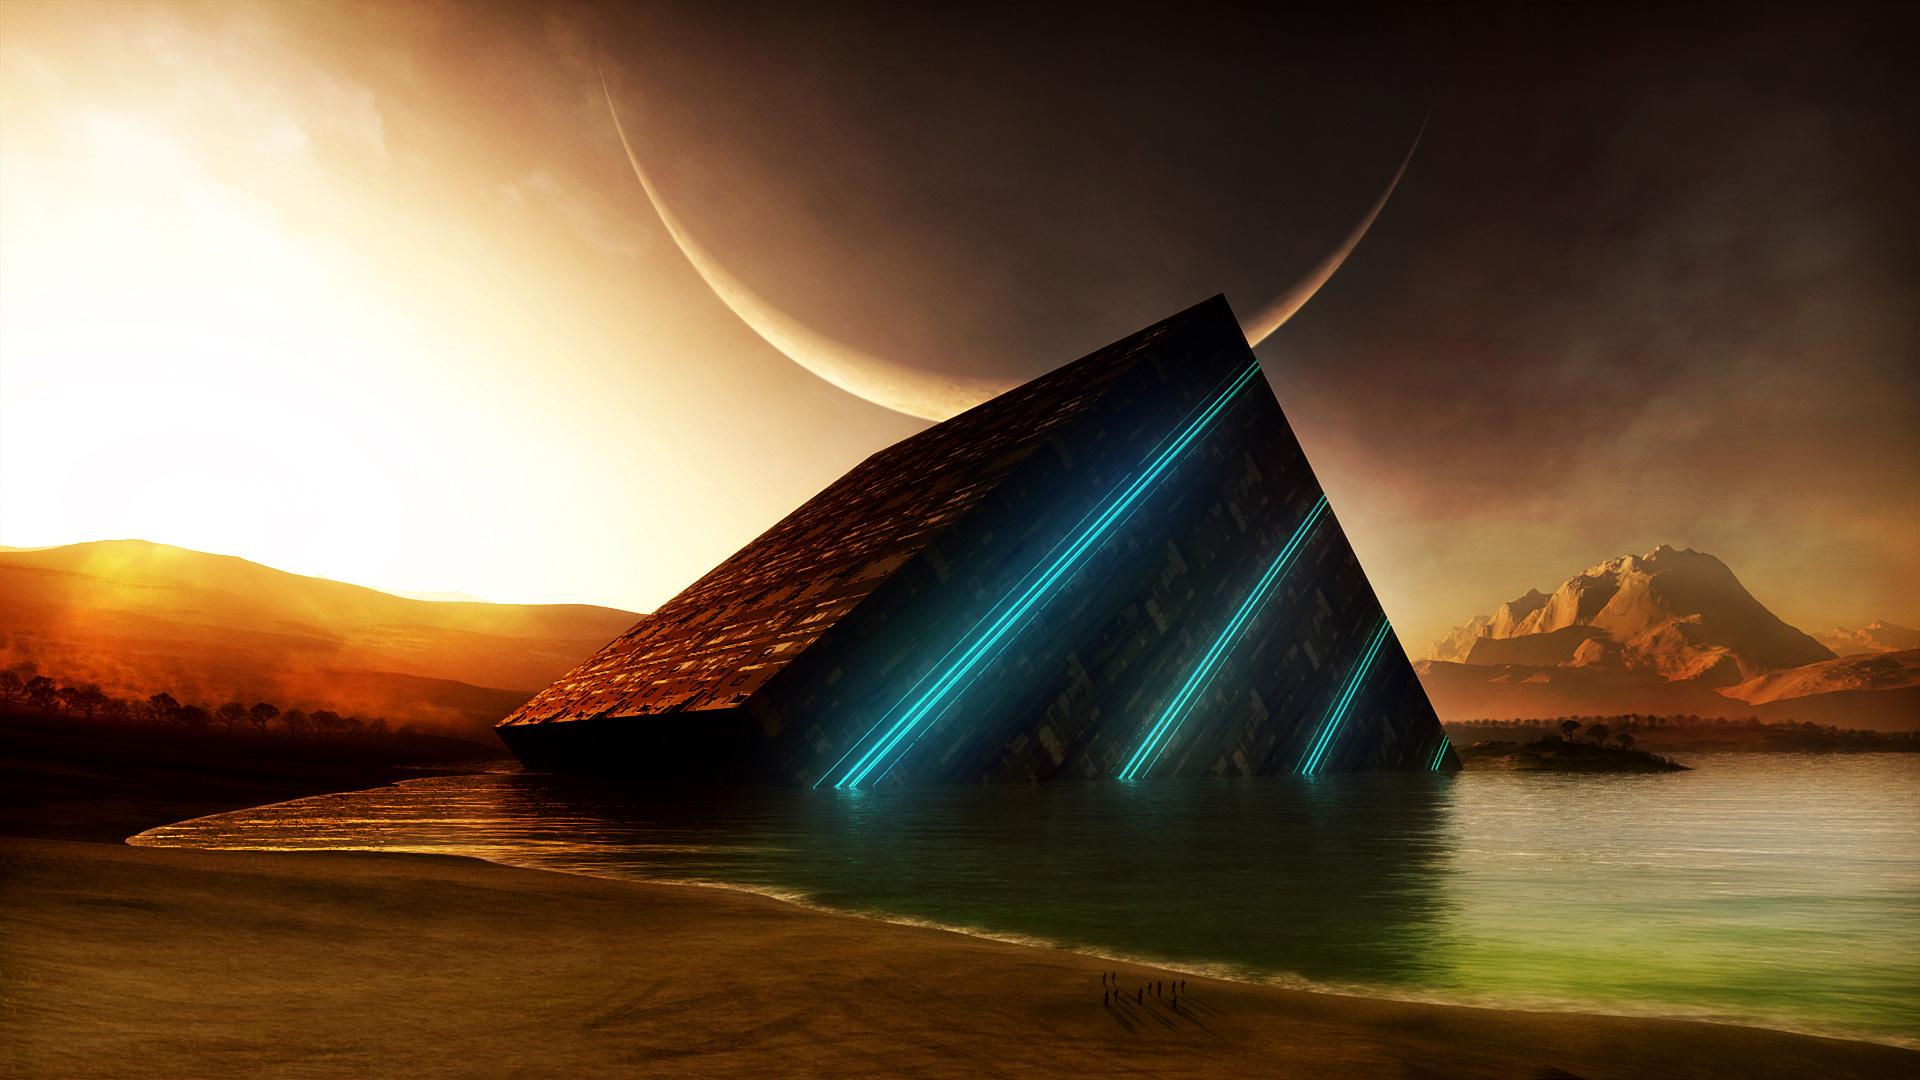 ... Sci Fi Landscape Wallpaper HD 4 High Resolution Wallpaper Full Size